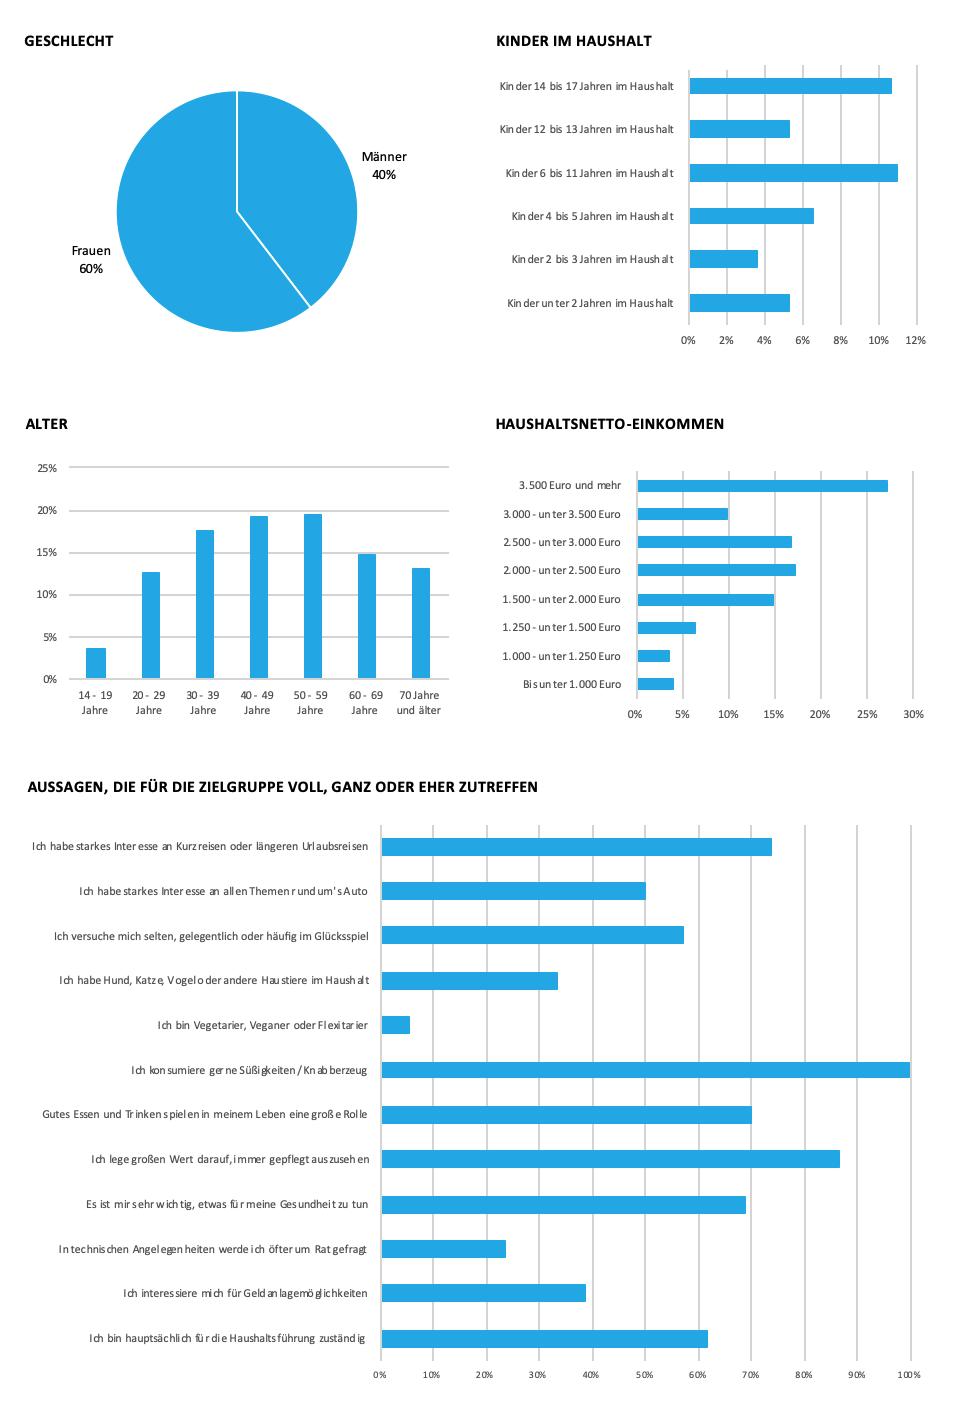 OTTO.de Grafik zu soziodemografischen Daten